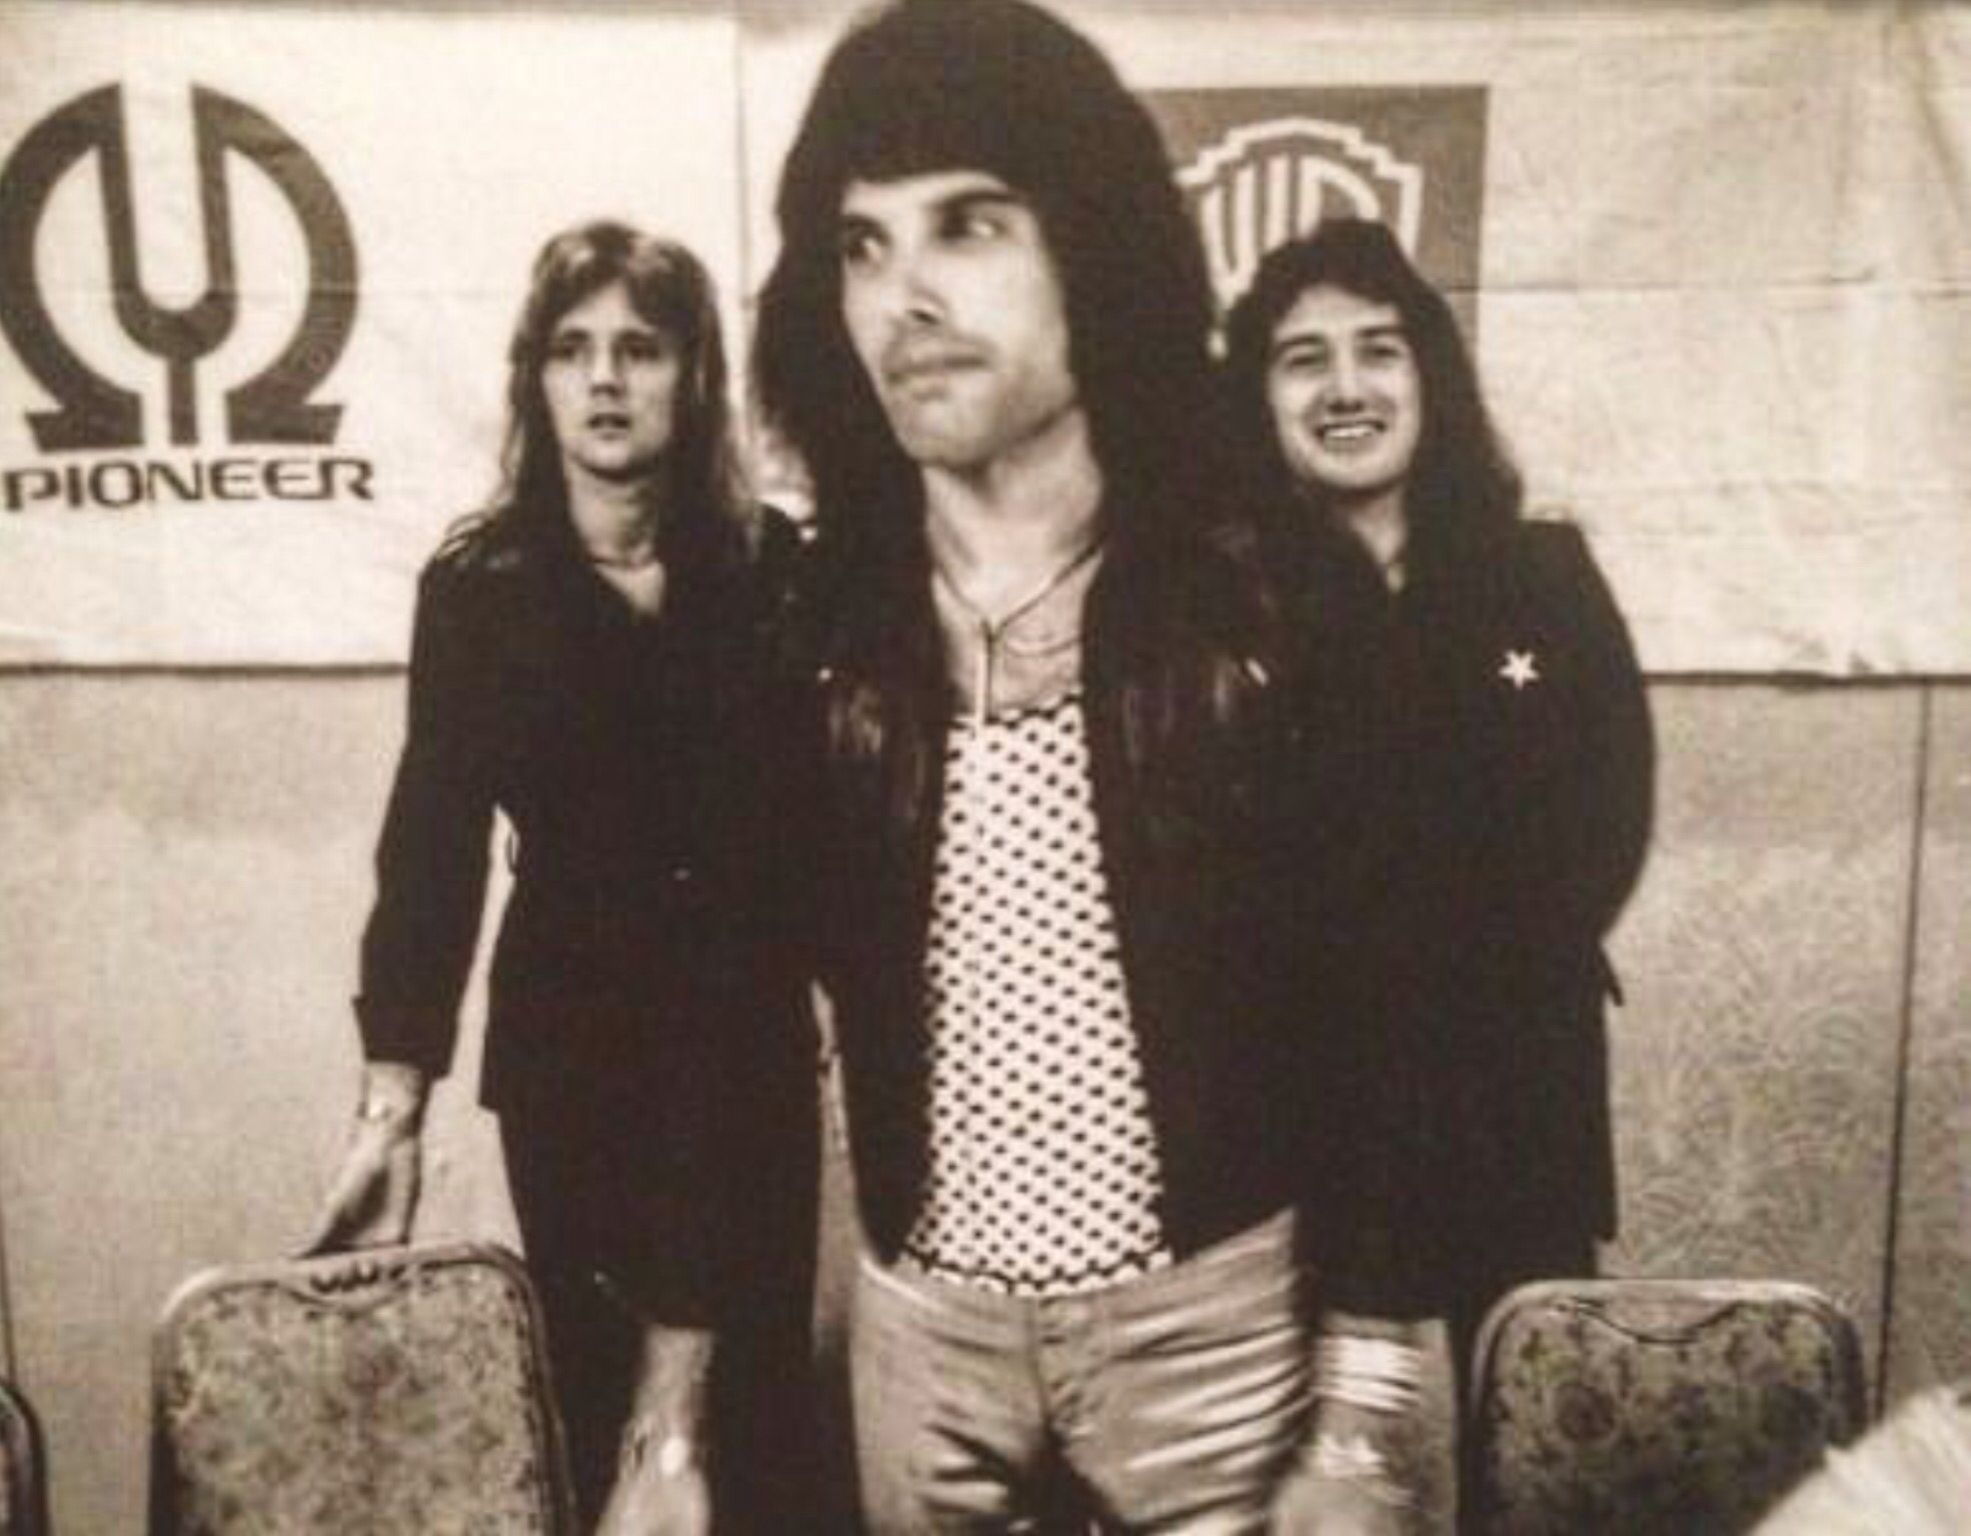 John Deacon: a legend against the success of Queen 98